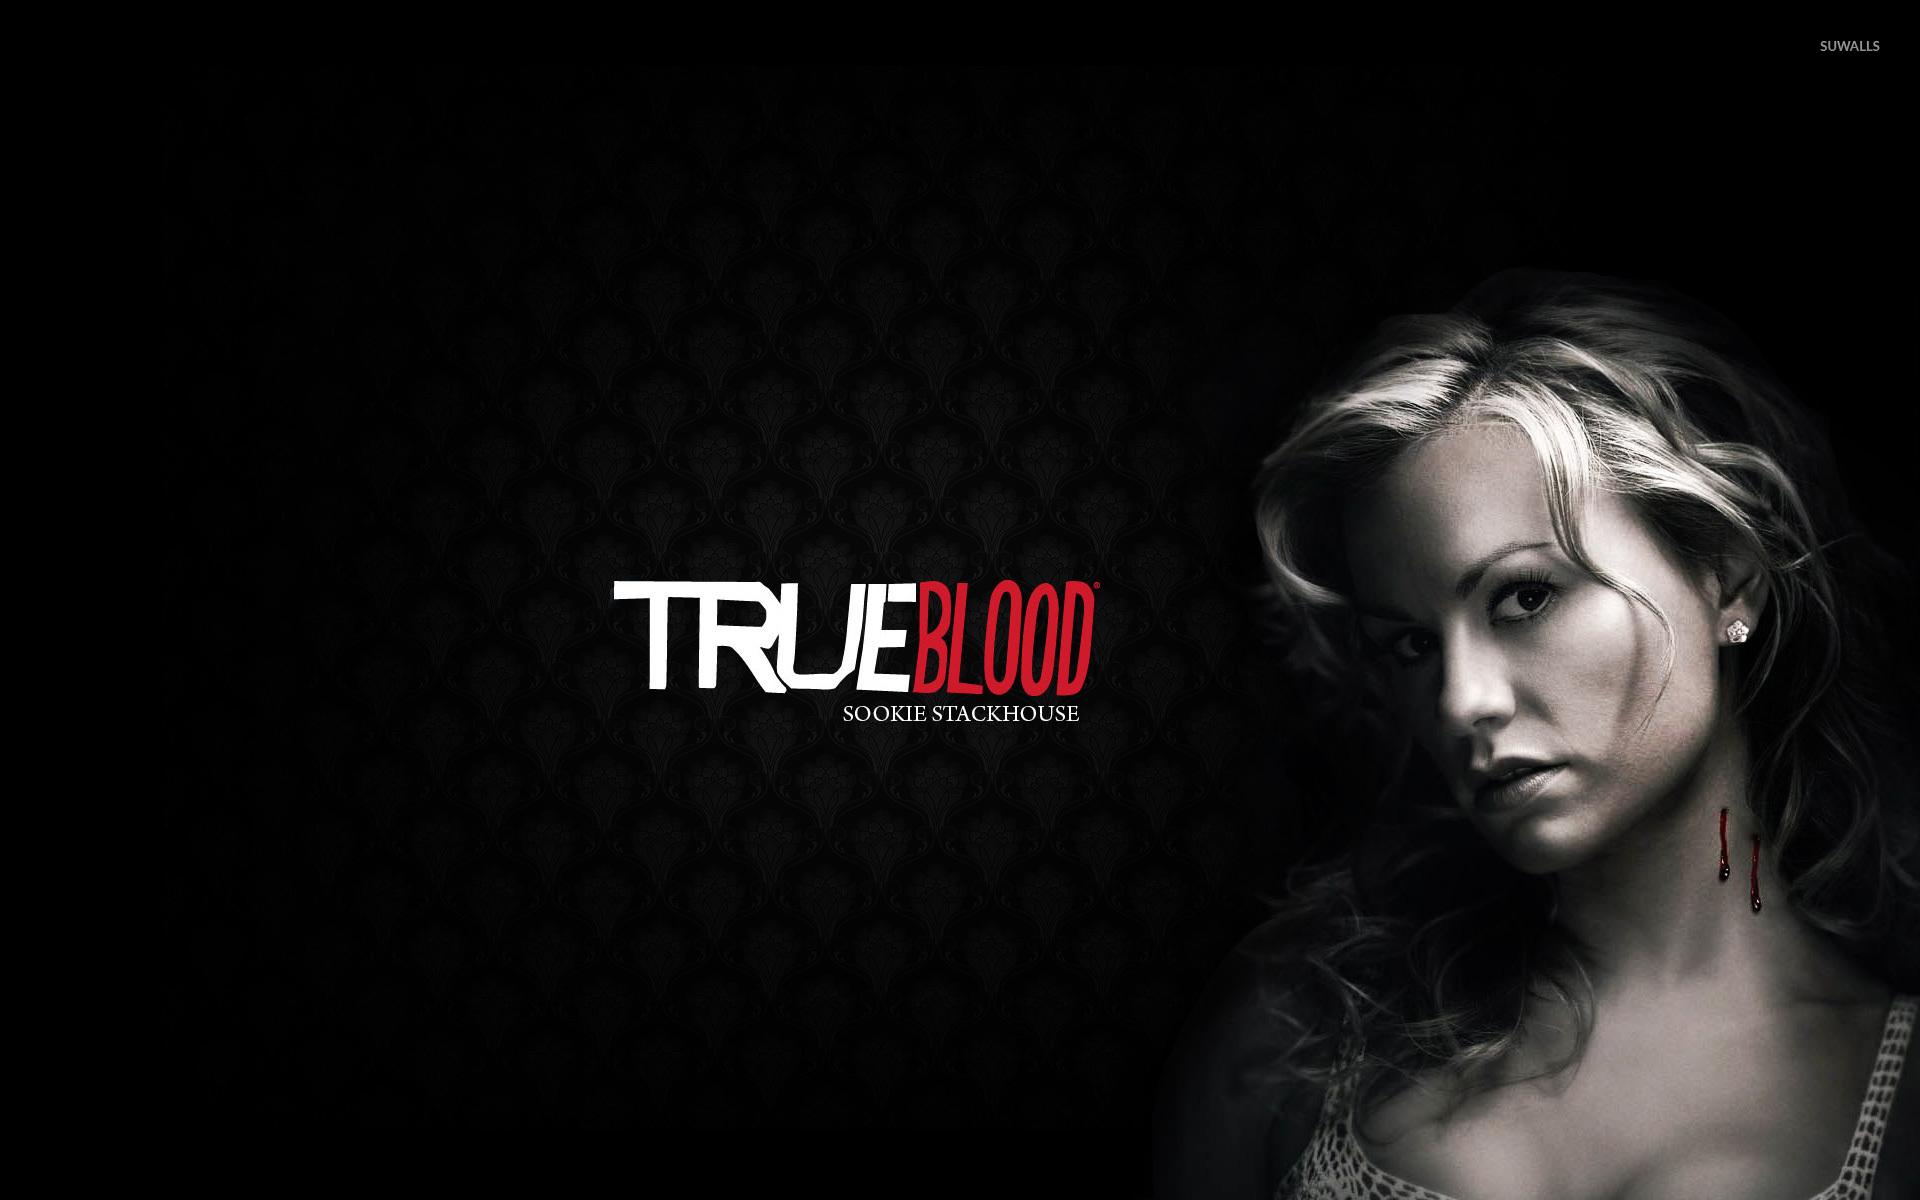 Download True Blood 3 Wallpaper